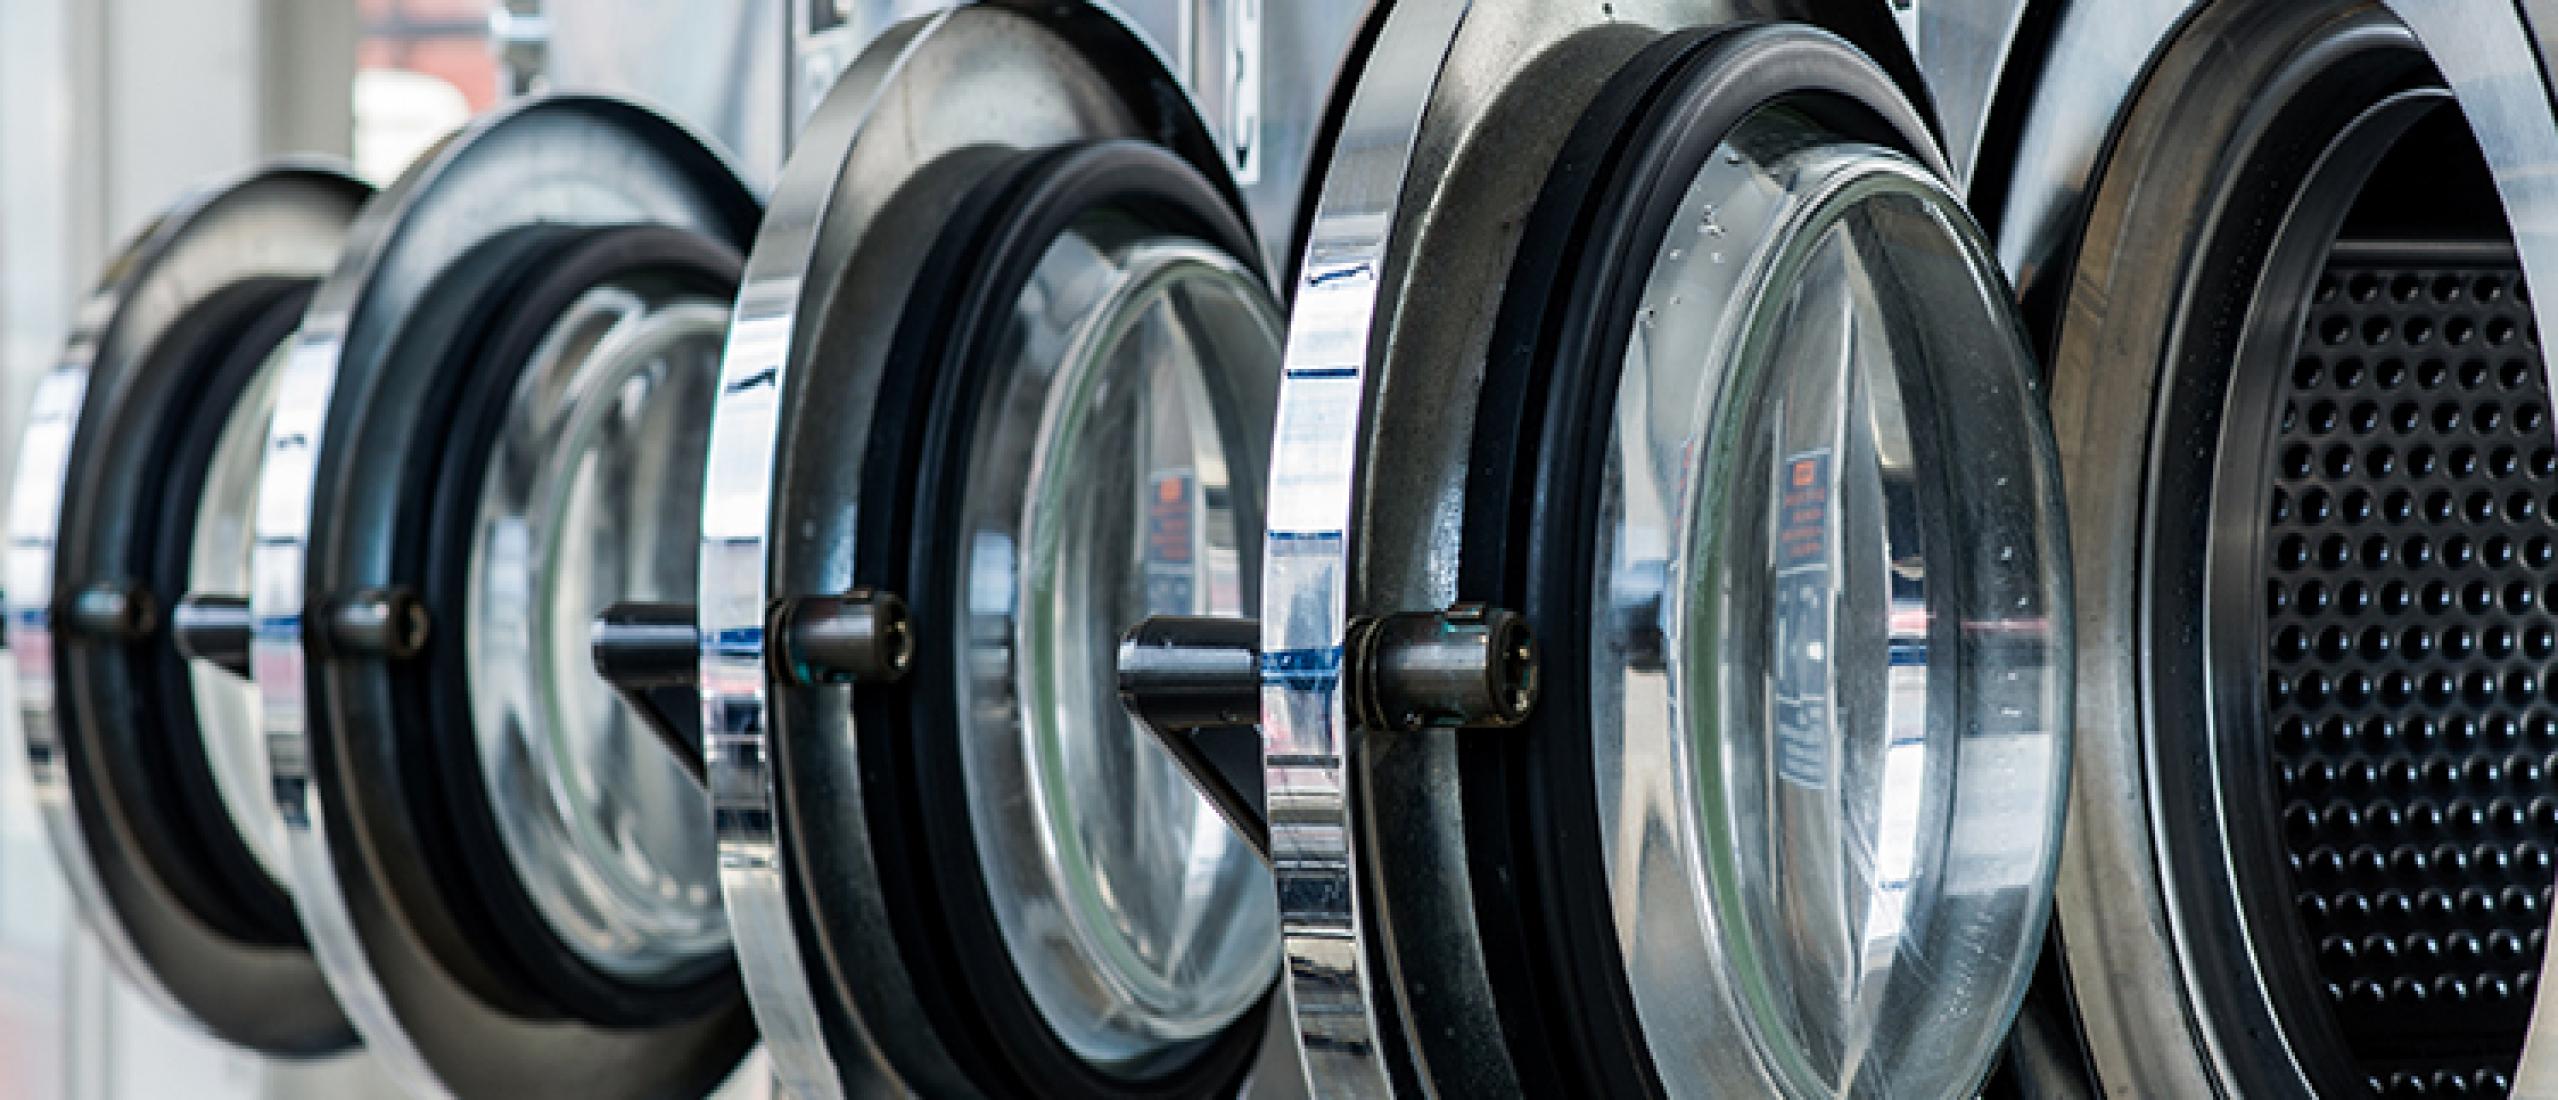 Werkkleding wassen: alles wat je moet weten